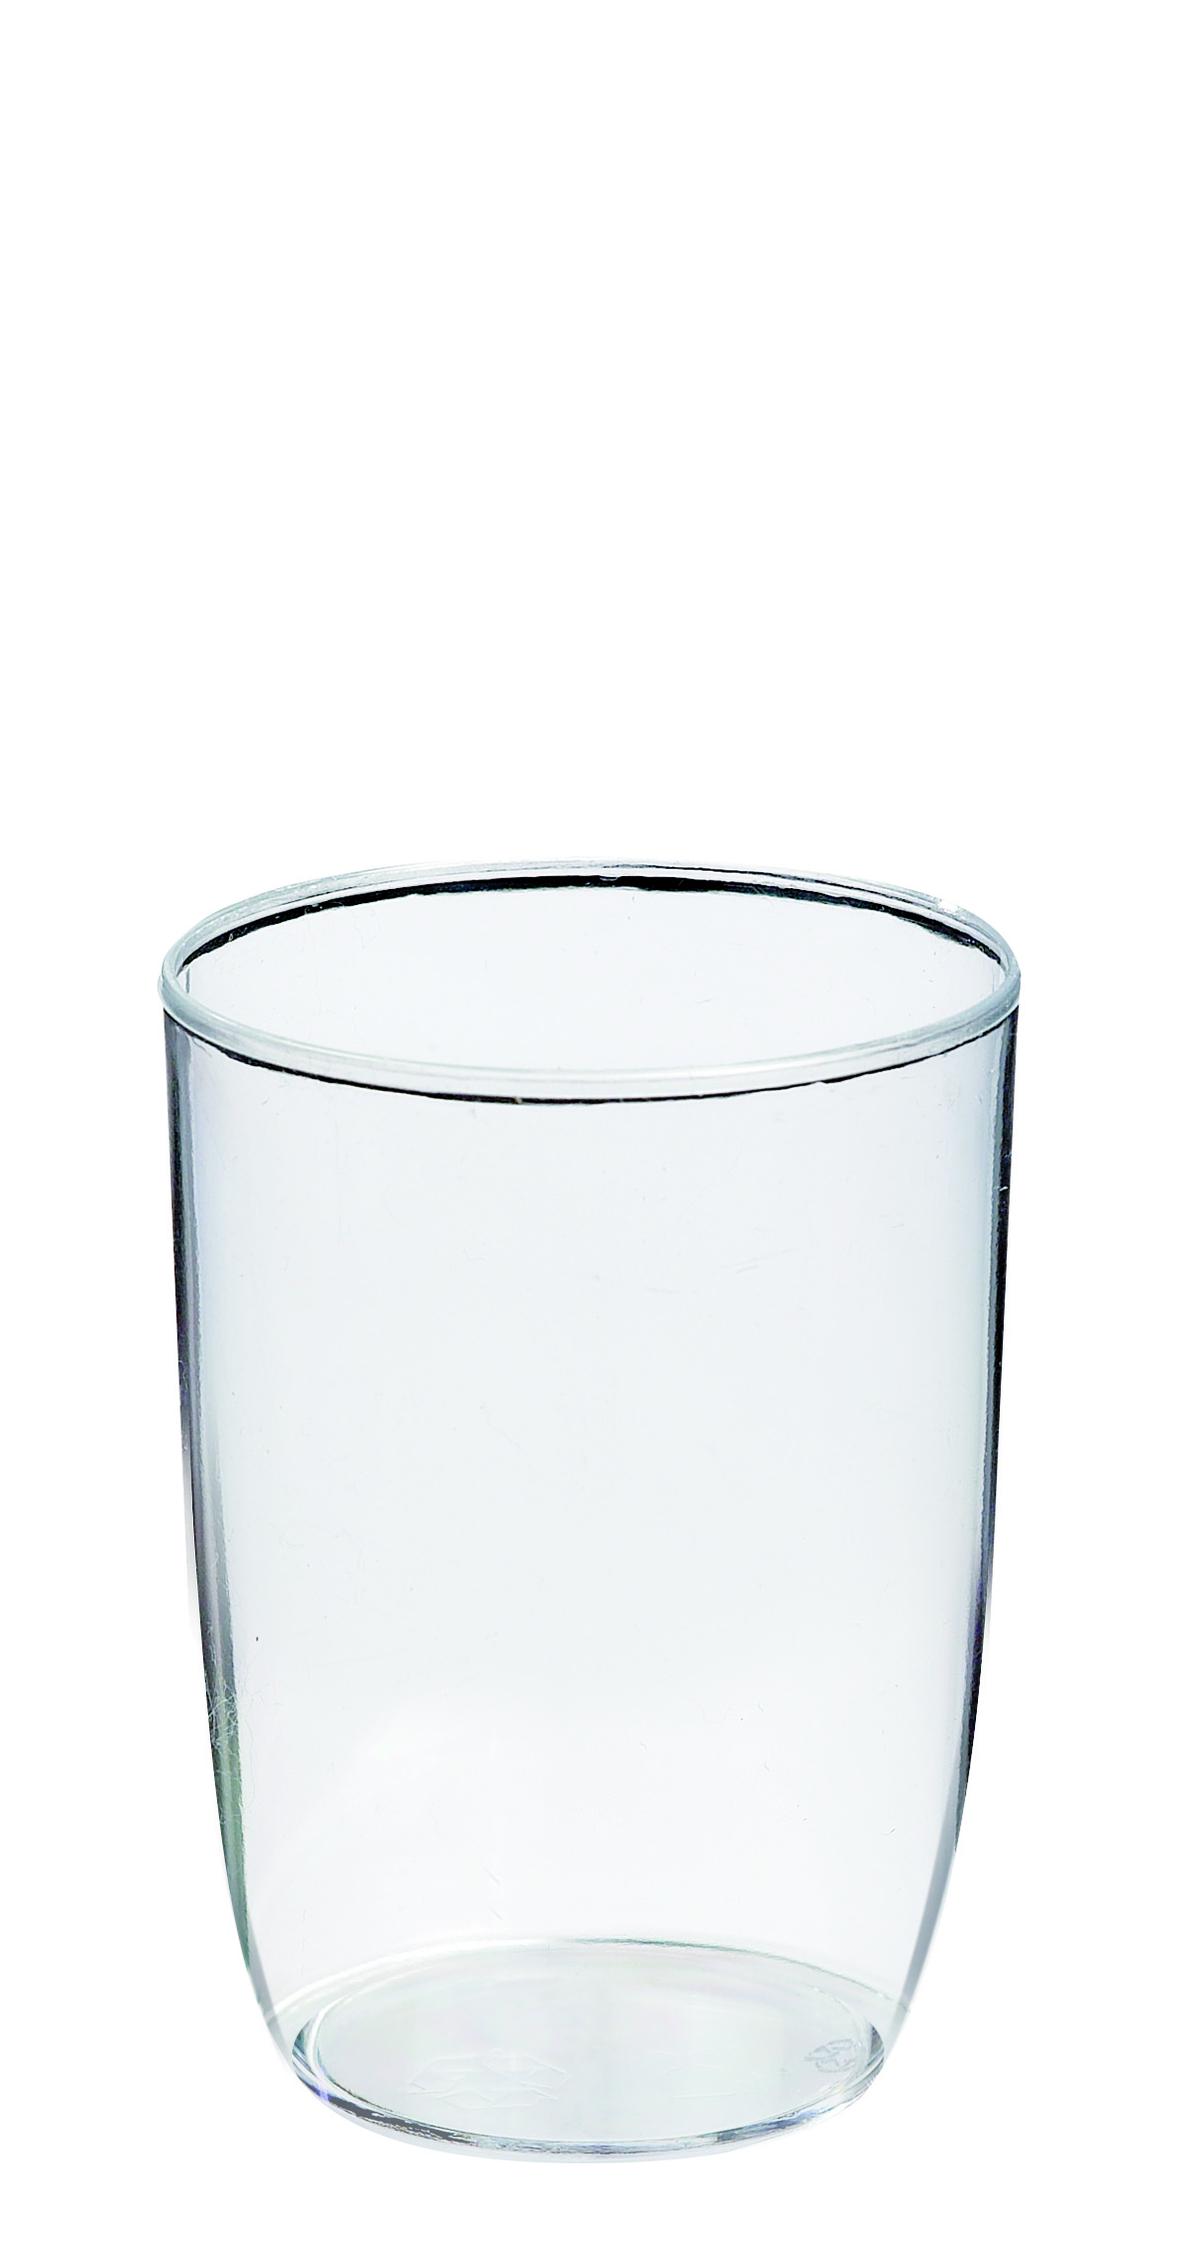 Verrine ronde transparente Ø 4 cm 3,5 cl Solia (60 pièces)